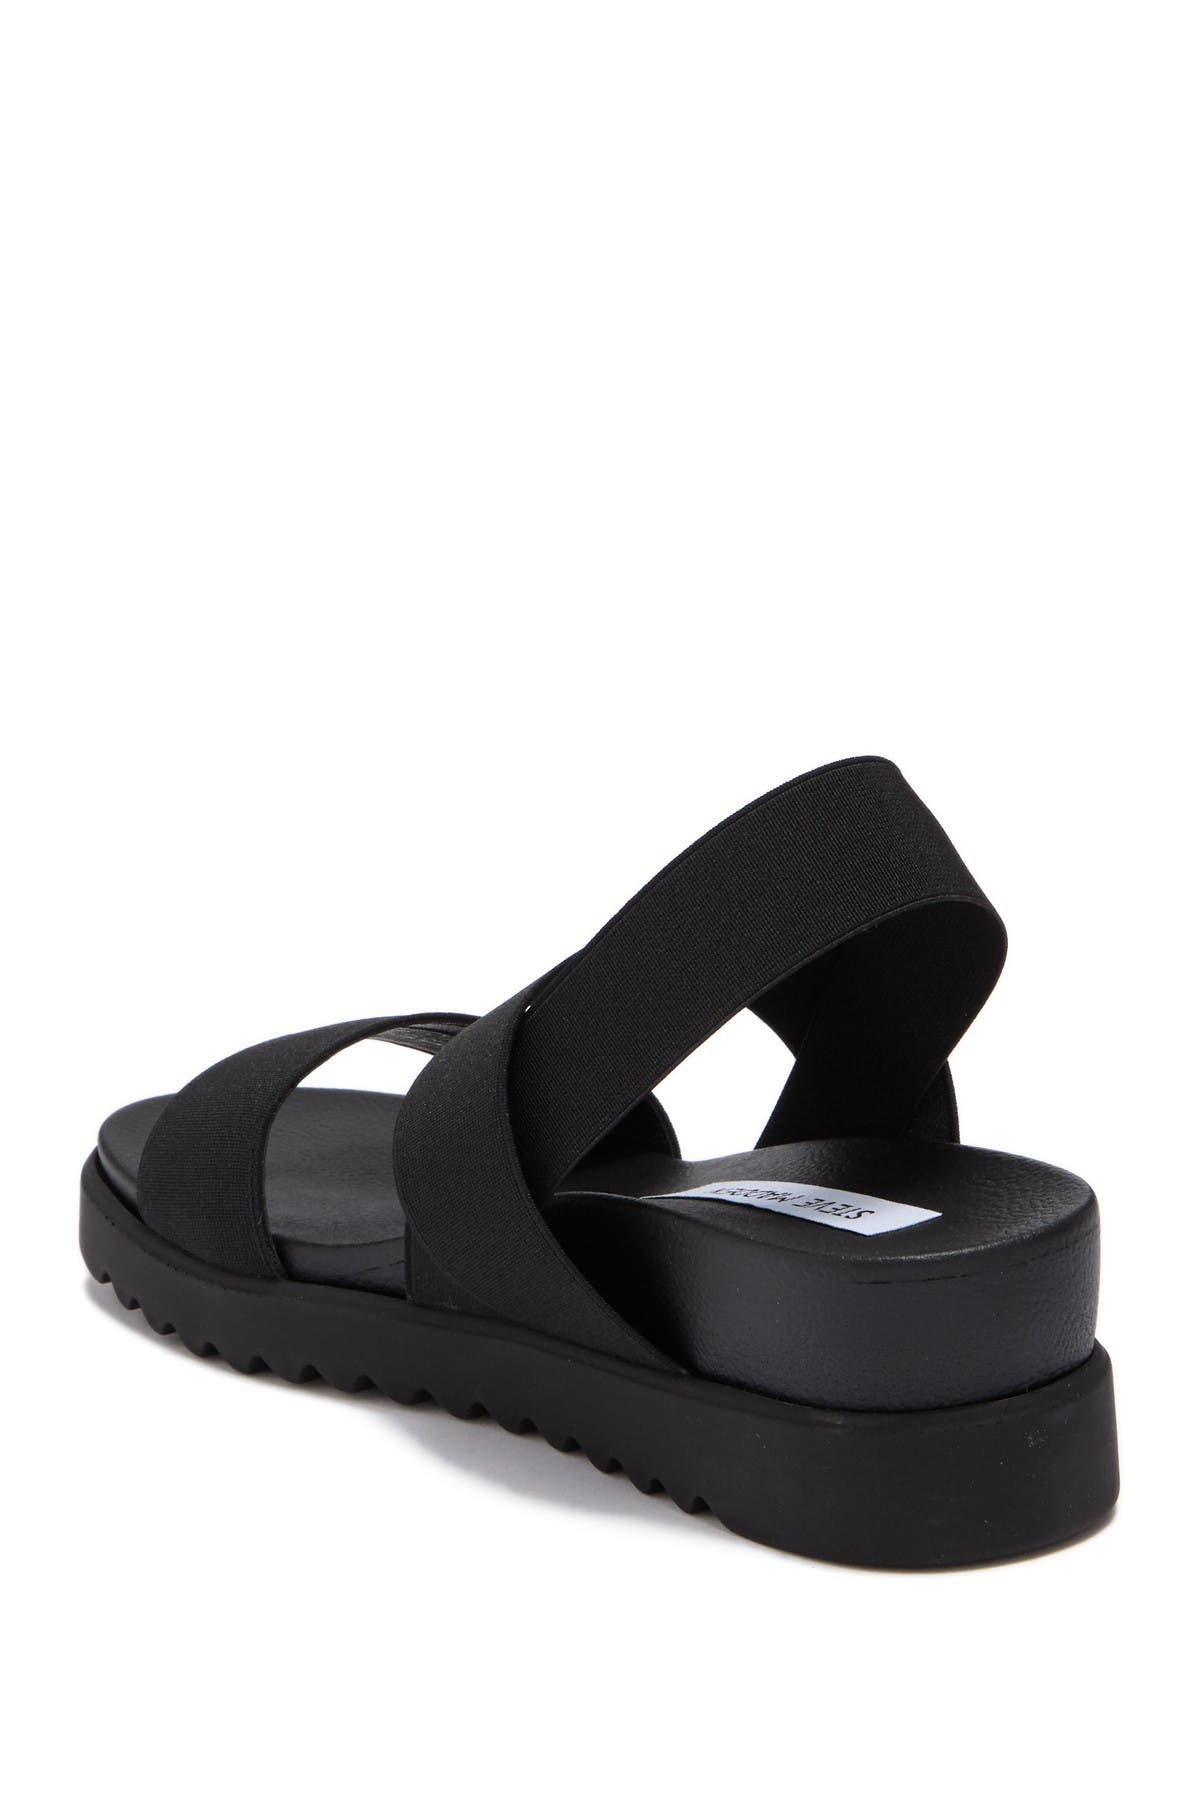 Finesse Double Band Platform Sandal